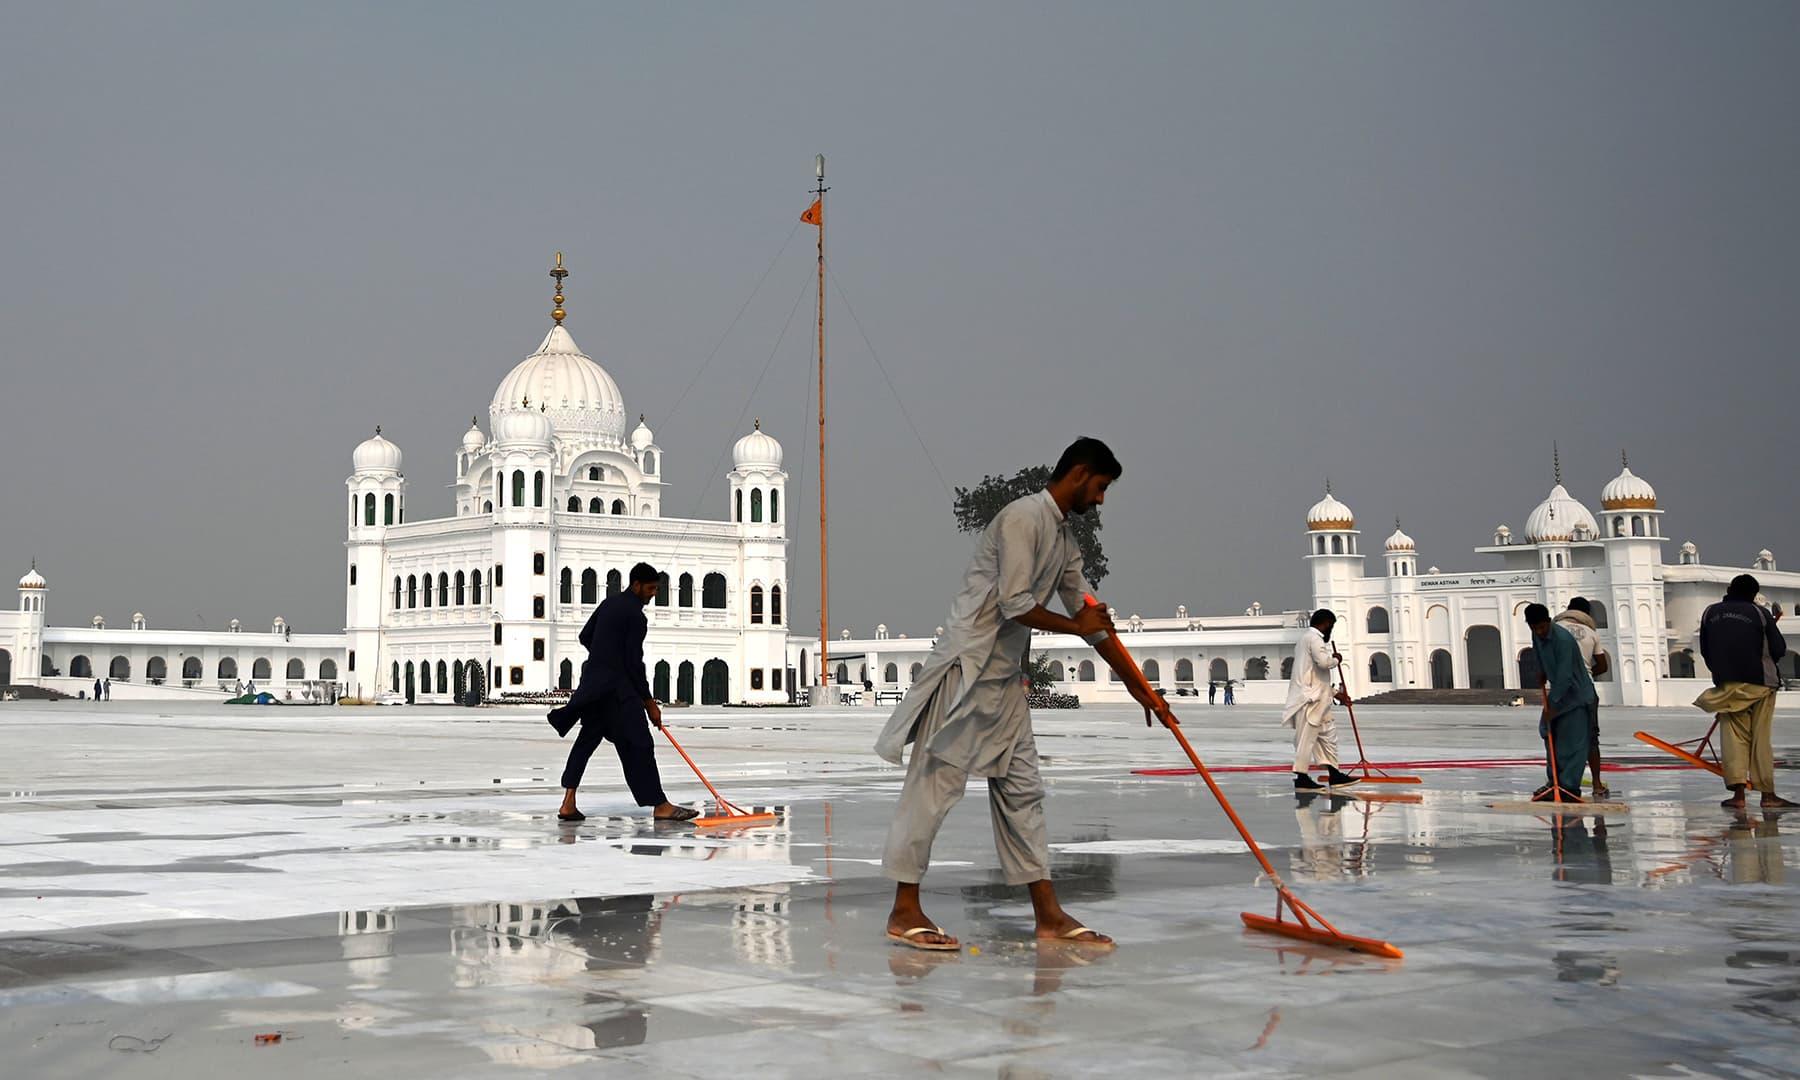 In this picture taken on November 6, workers clean the floor at the Shrine of Baba Guru Nanak Dev at the Gurdwara Darbar Sahib, ahead of its opening in Kartarpur. — AFP